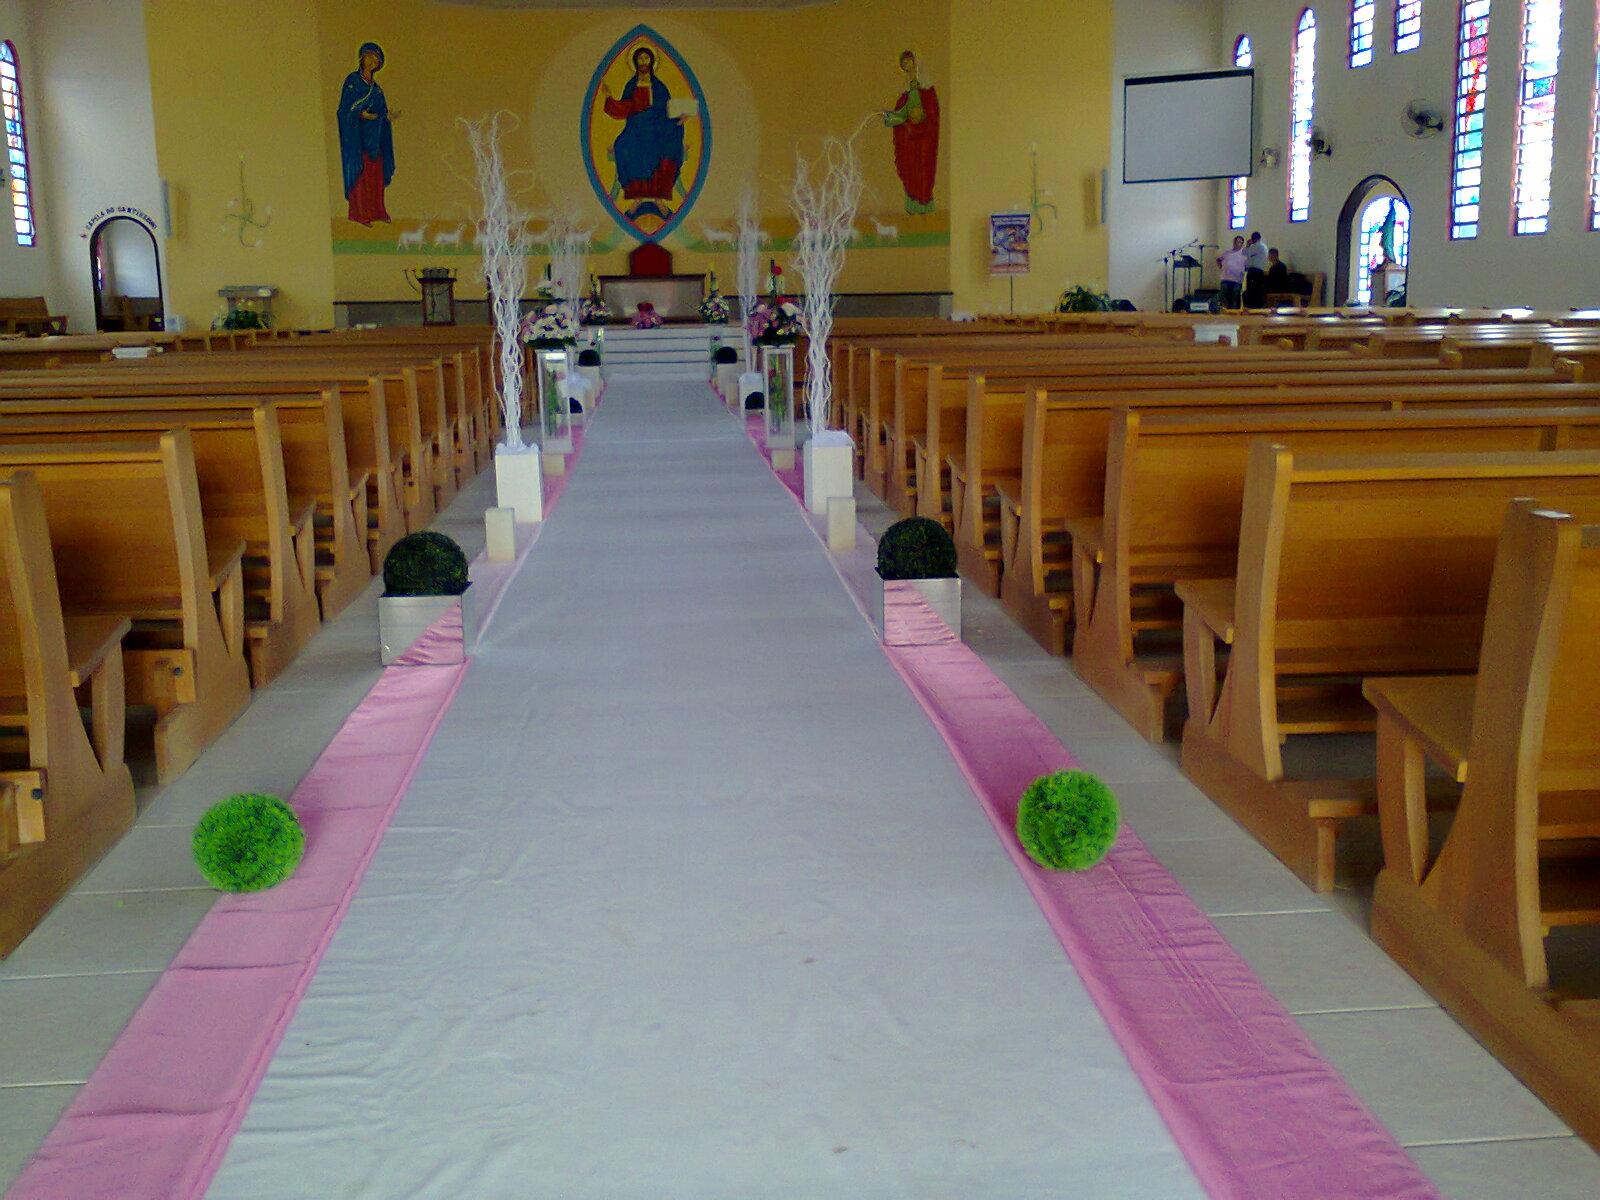 Decoração de igreja 47-30234087